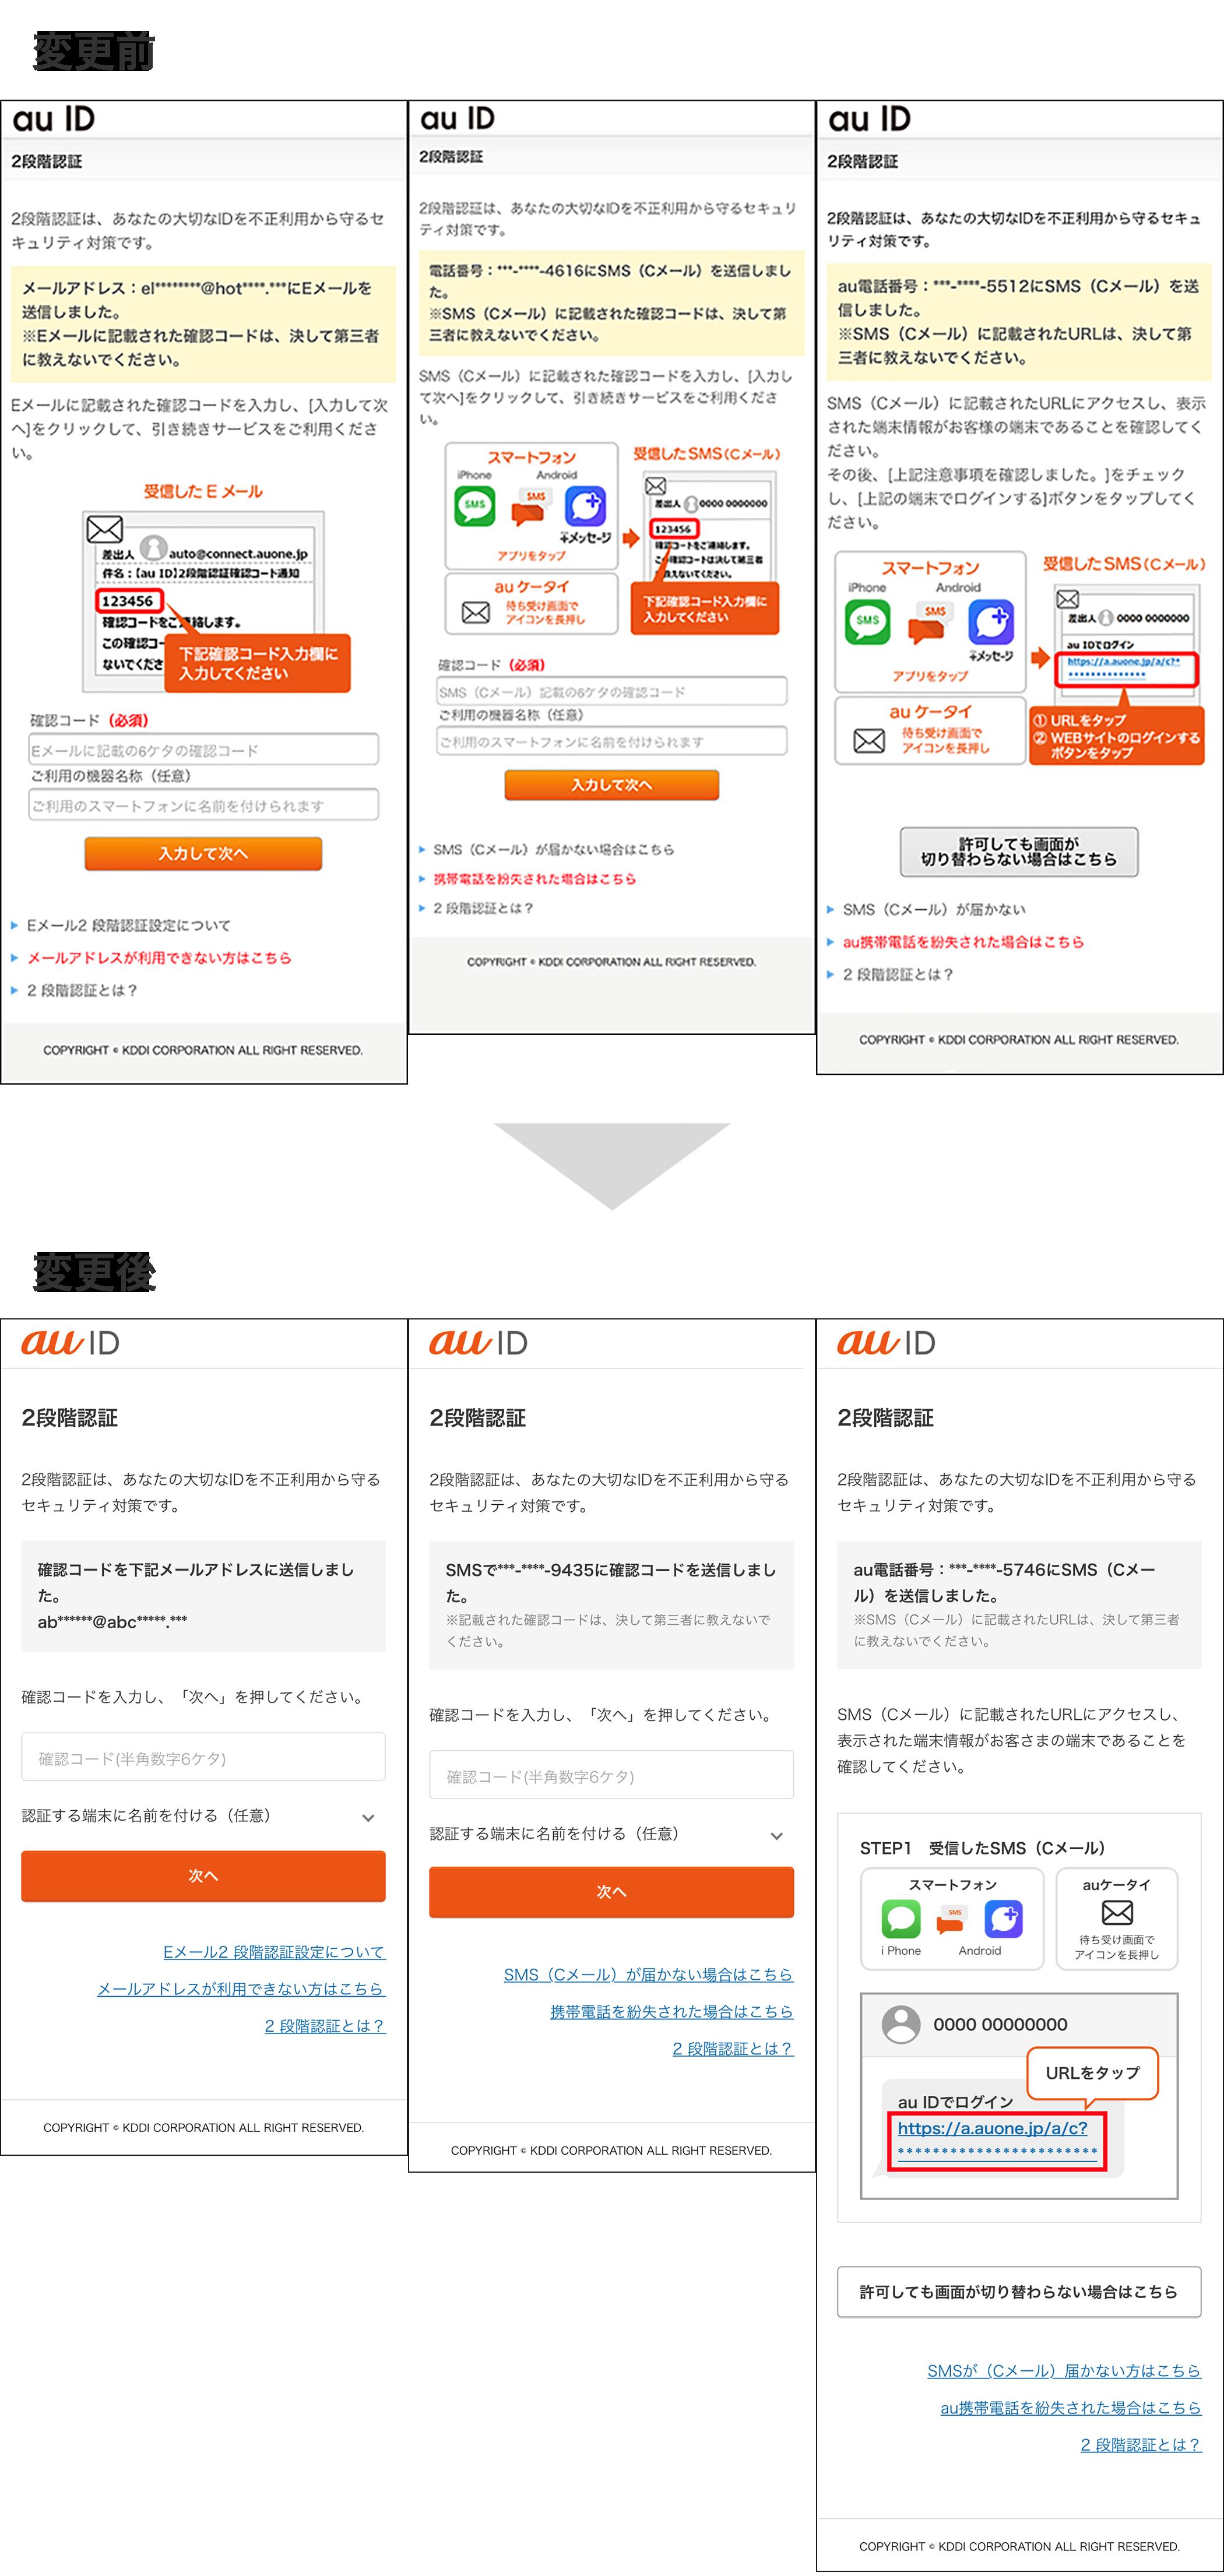 Web メール auone